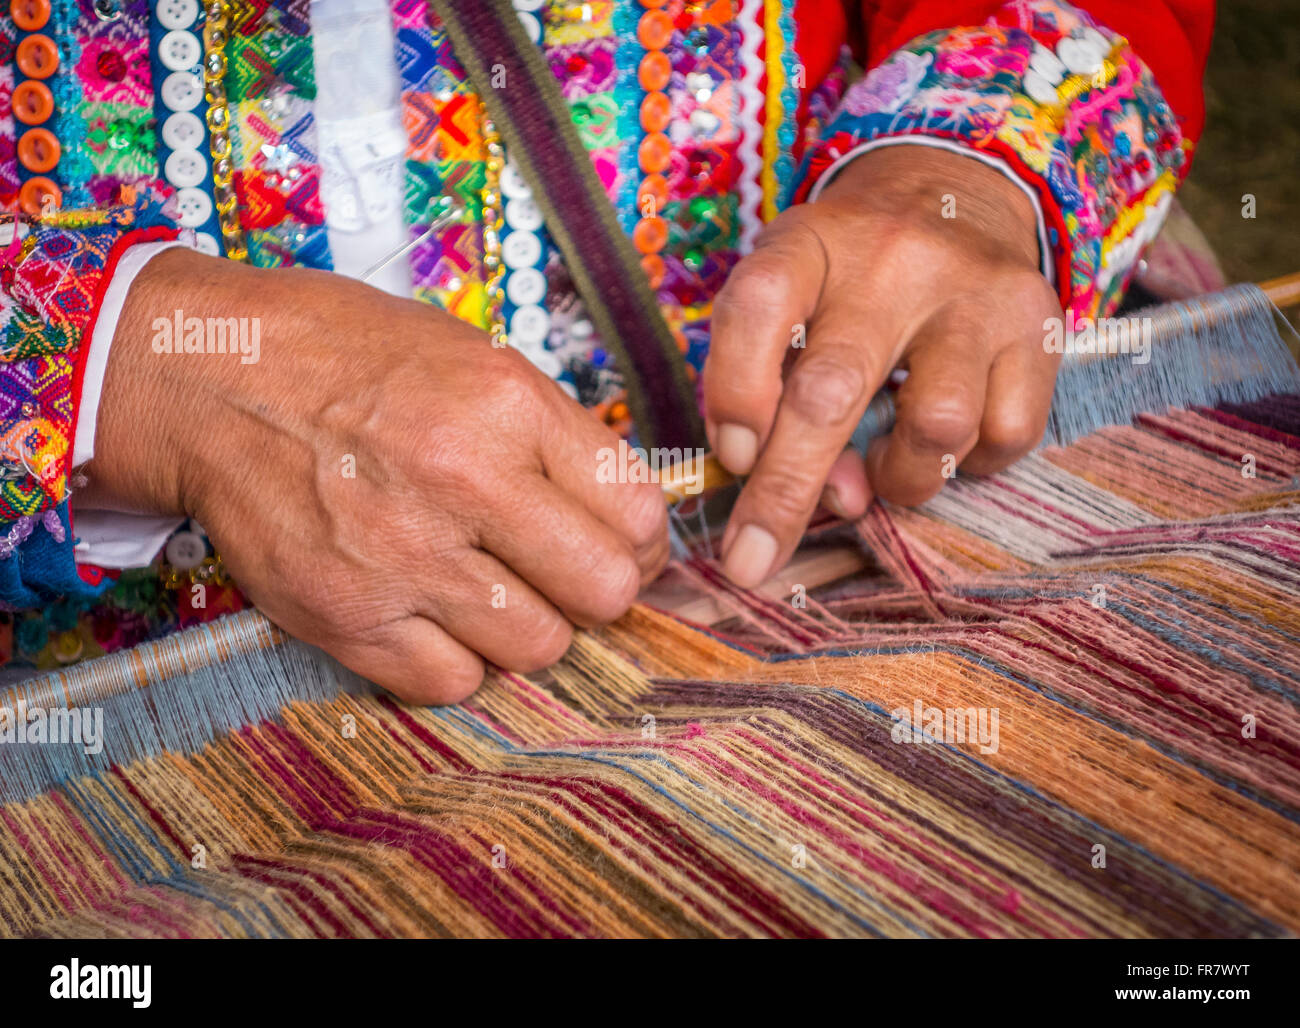 WASHINGTON, DC, USA - Woman fdemonstrates weaving with backstrap loom (awana), during 2015 Smithsonian Folk Life - Stock Image